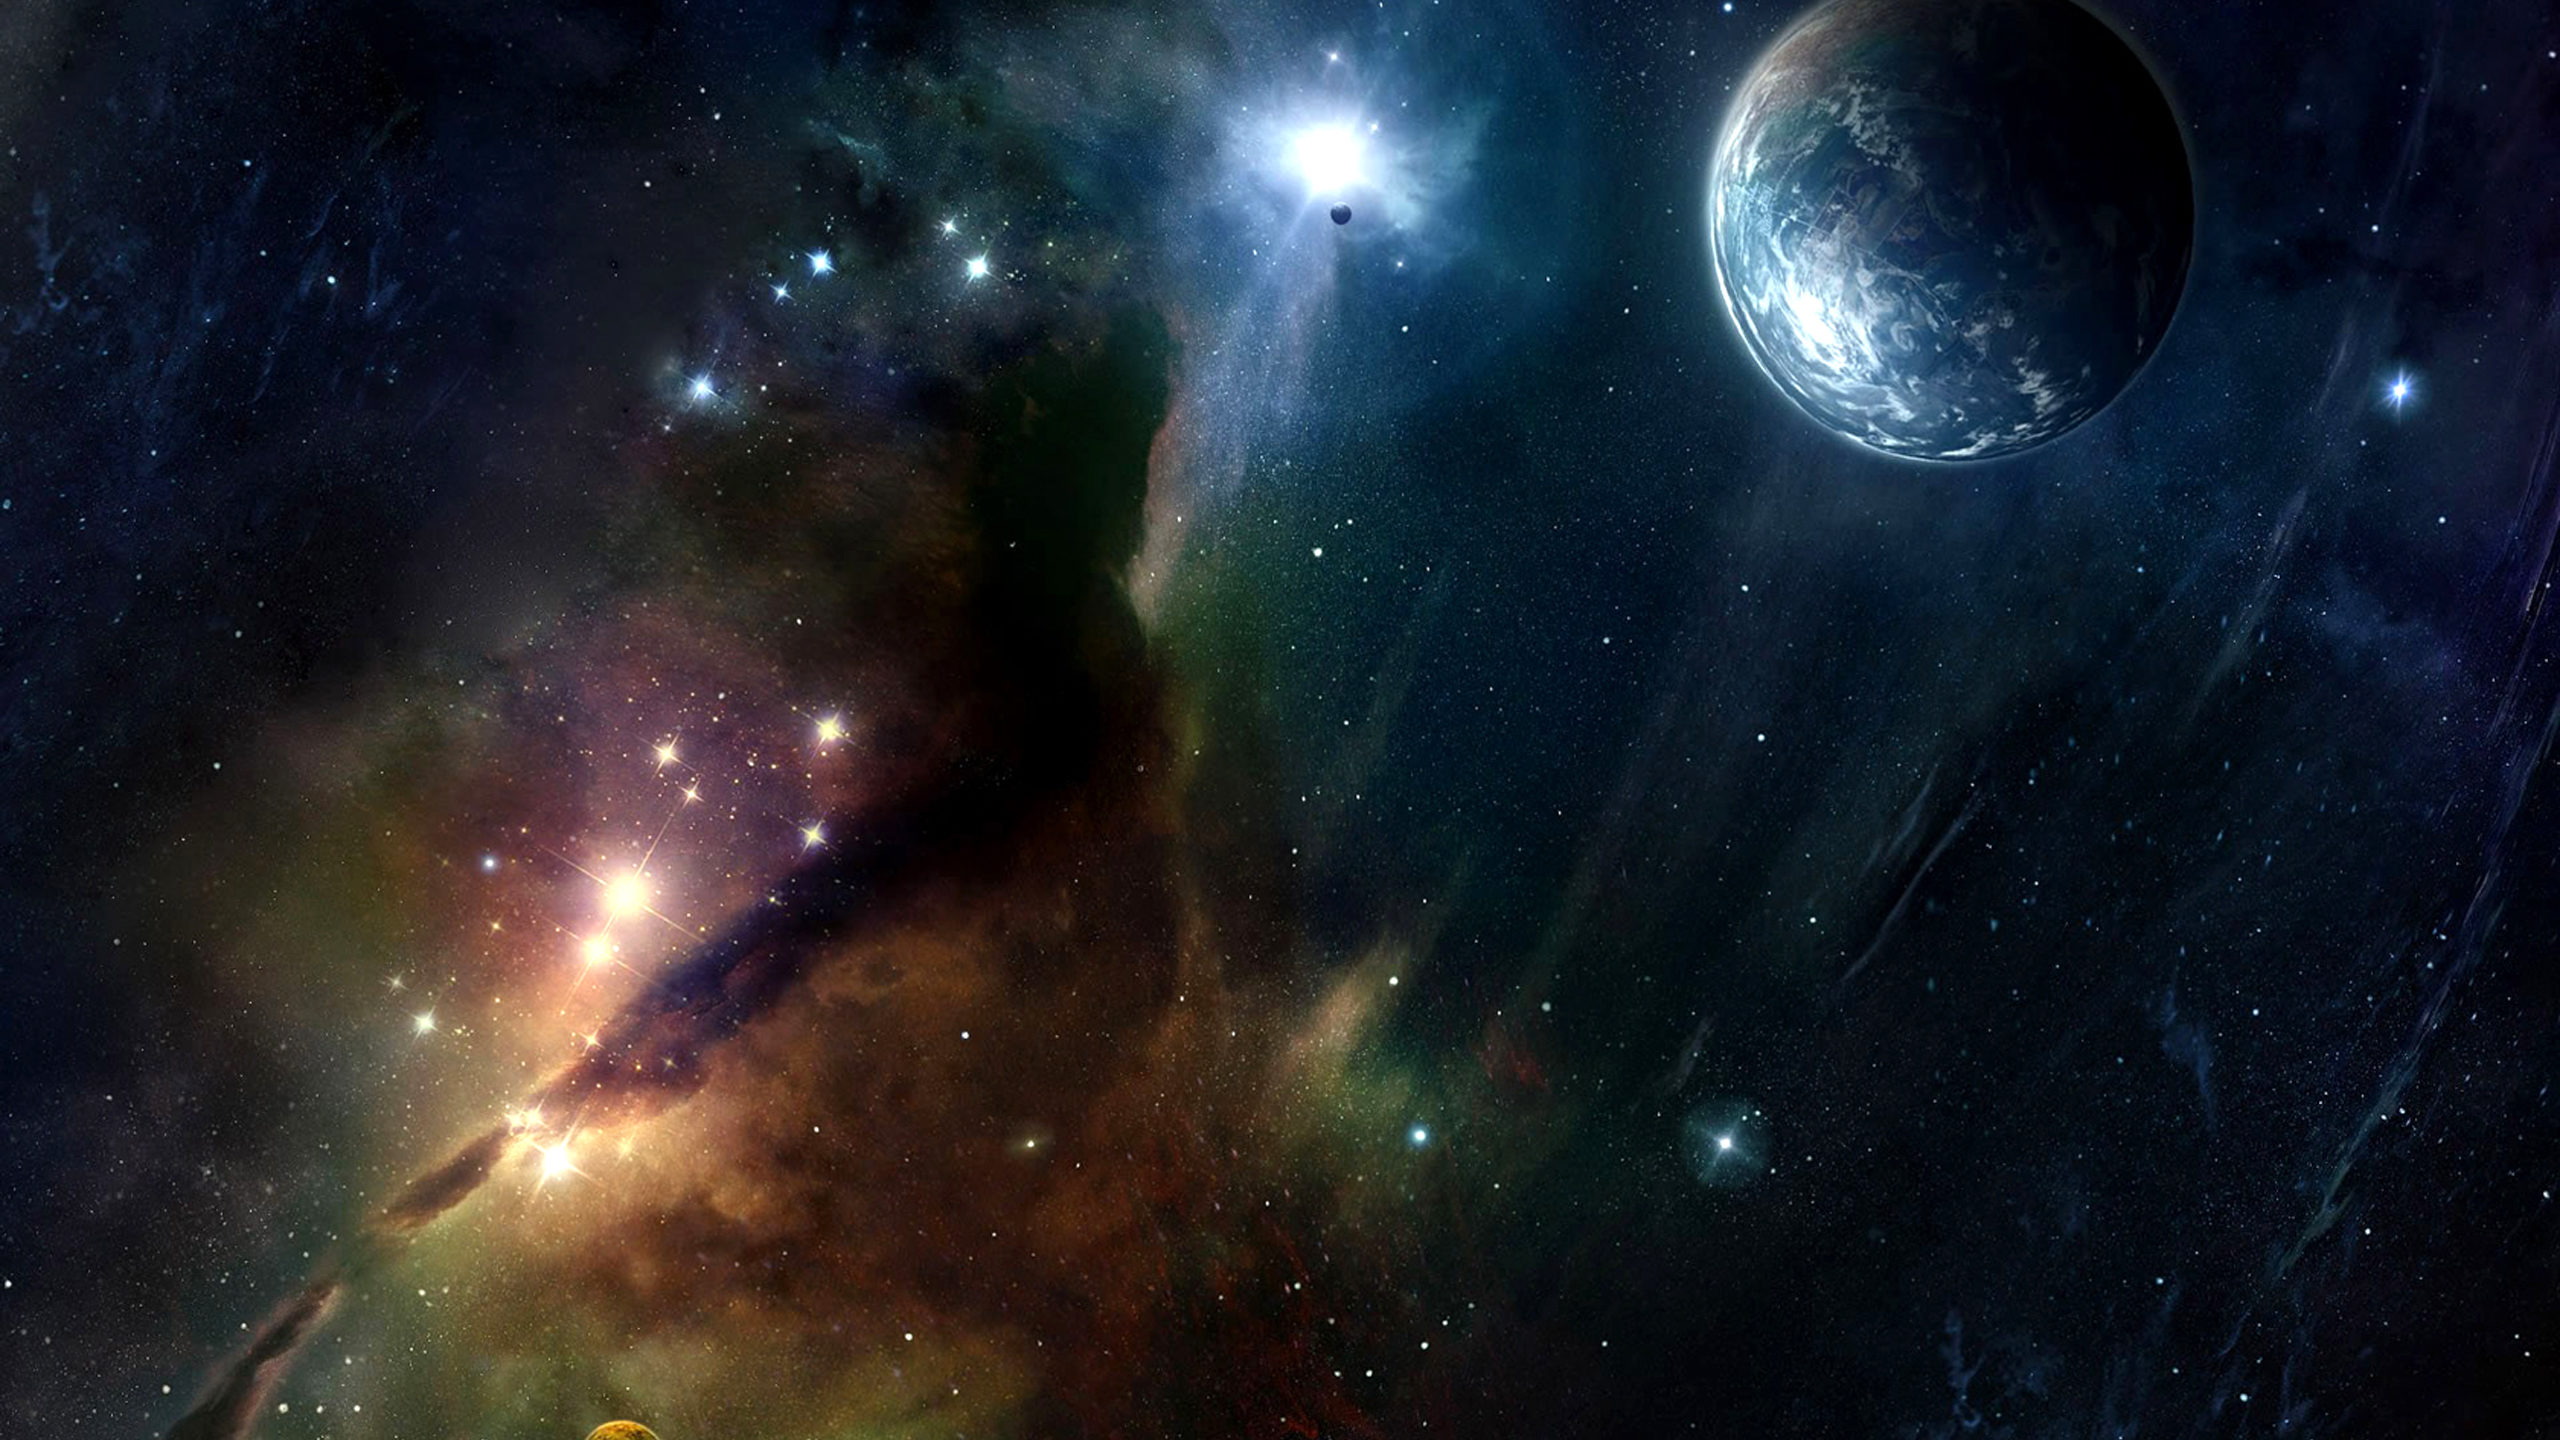 space desktop backgrounds stars | www.topsimages